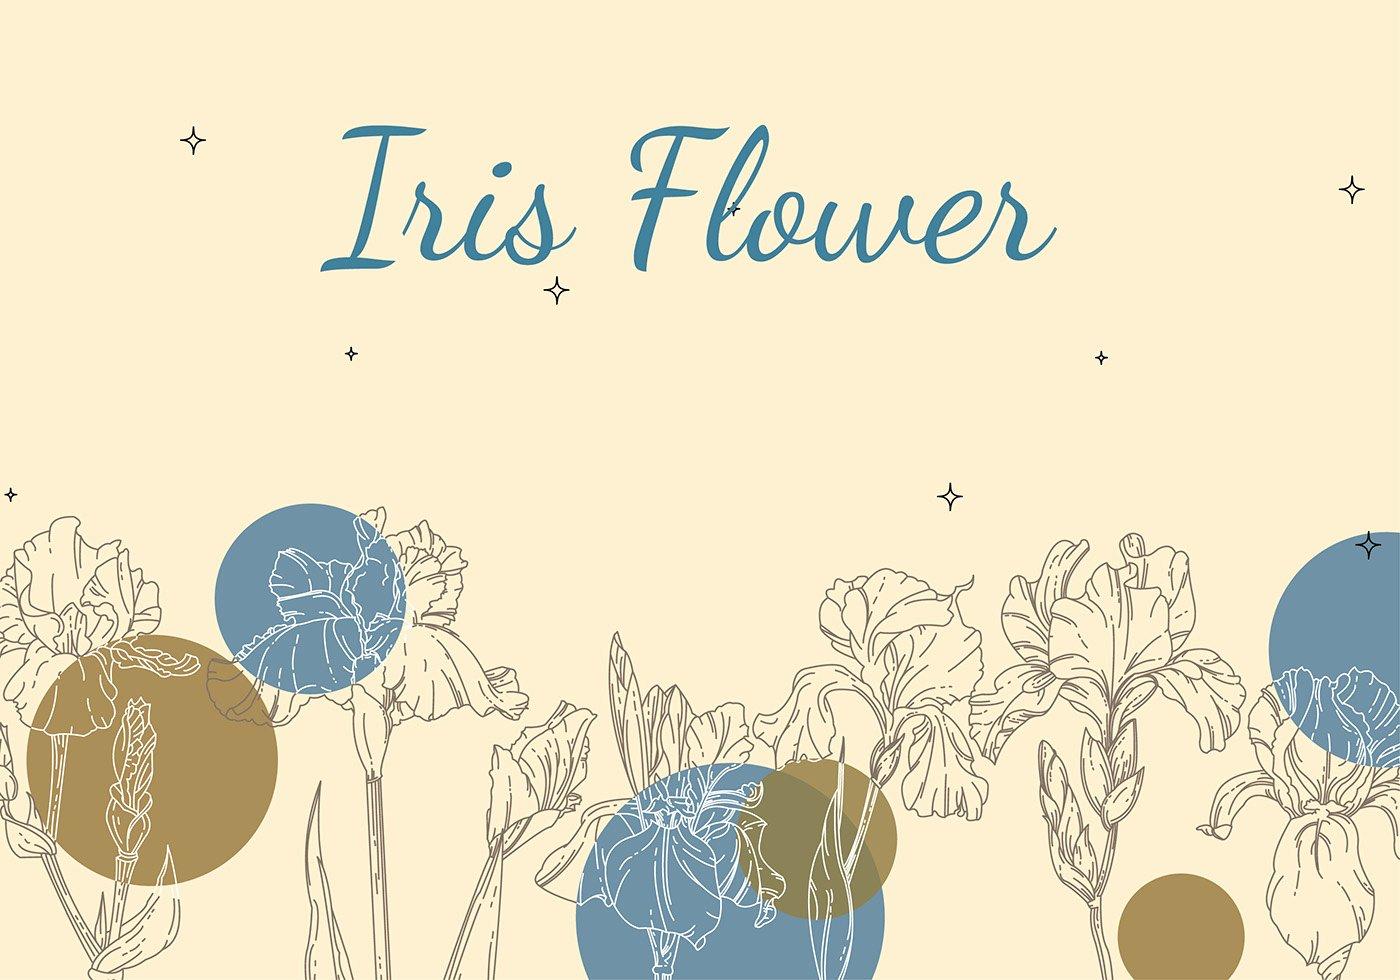 Iris Flower Outline Luxury Iris Flower Background Outline Free Vector Download Free